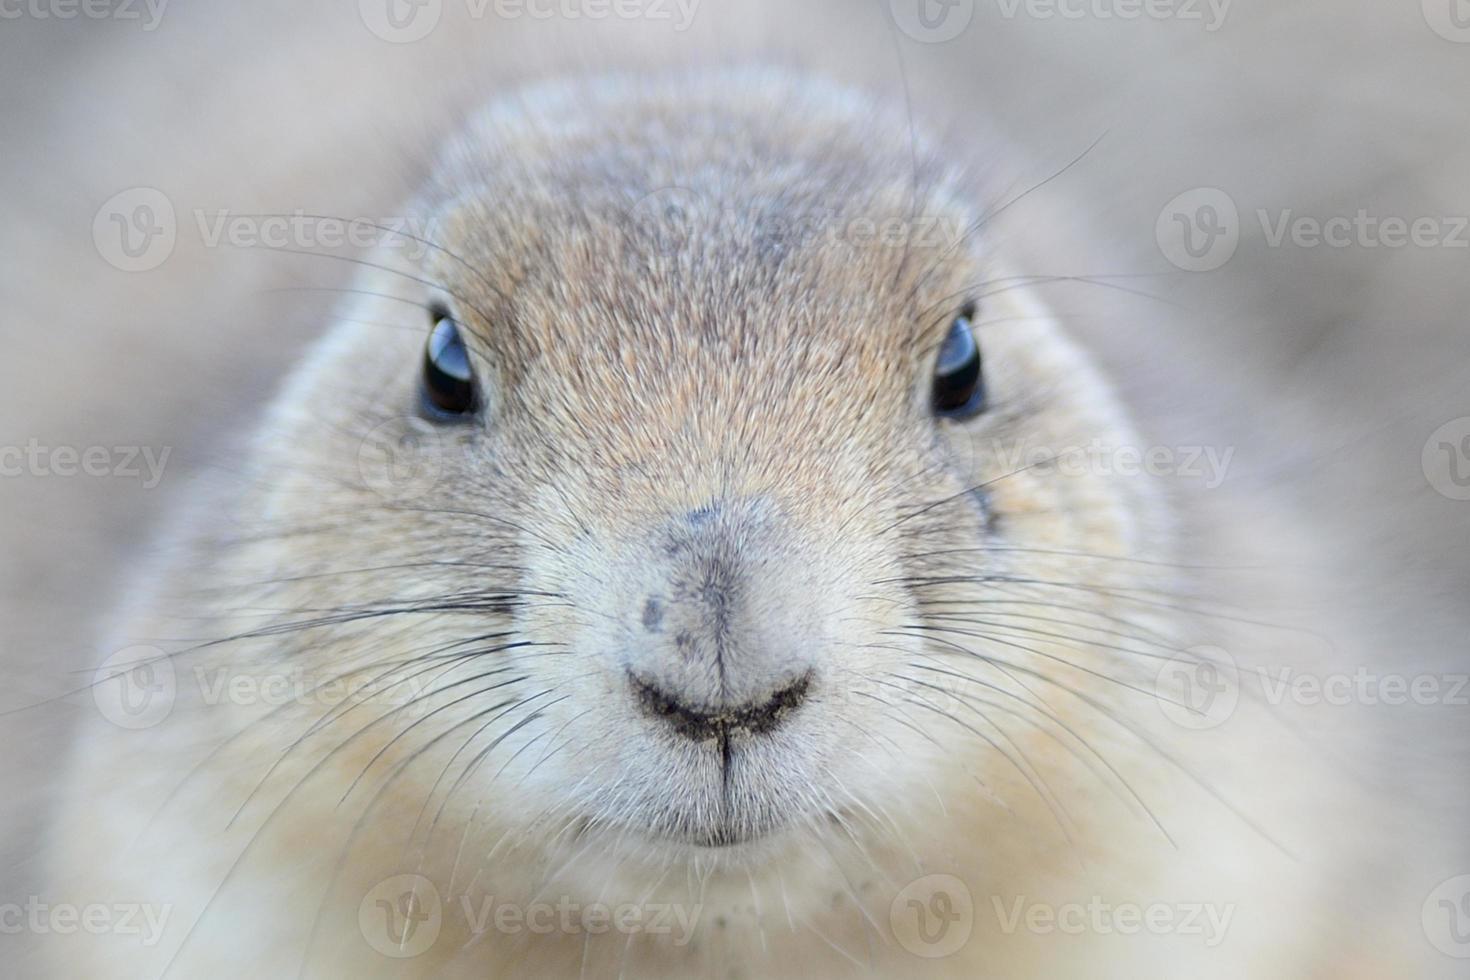 Prairie dog face up close photo